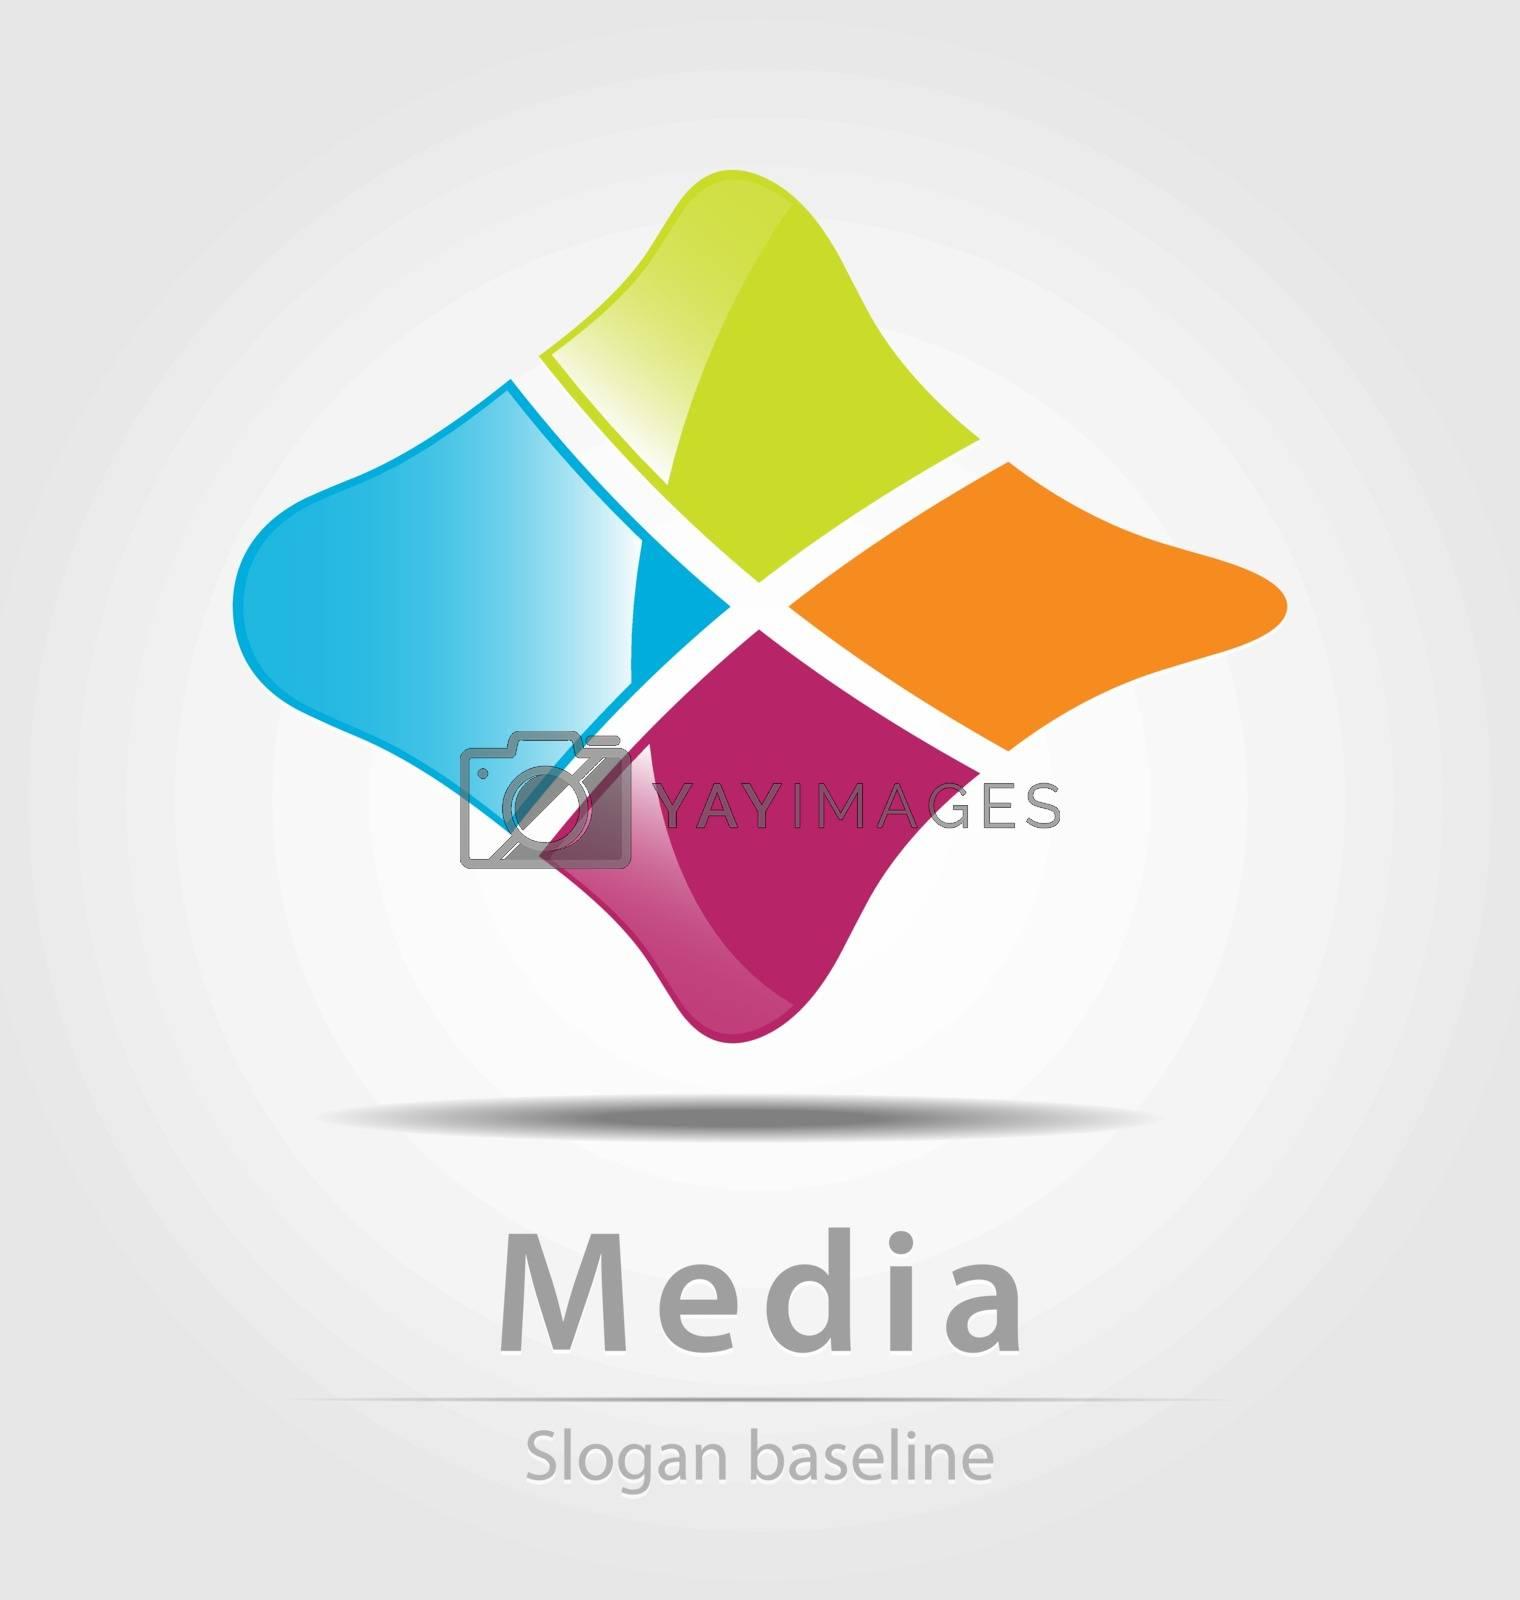 Originally created vector business icon